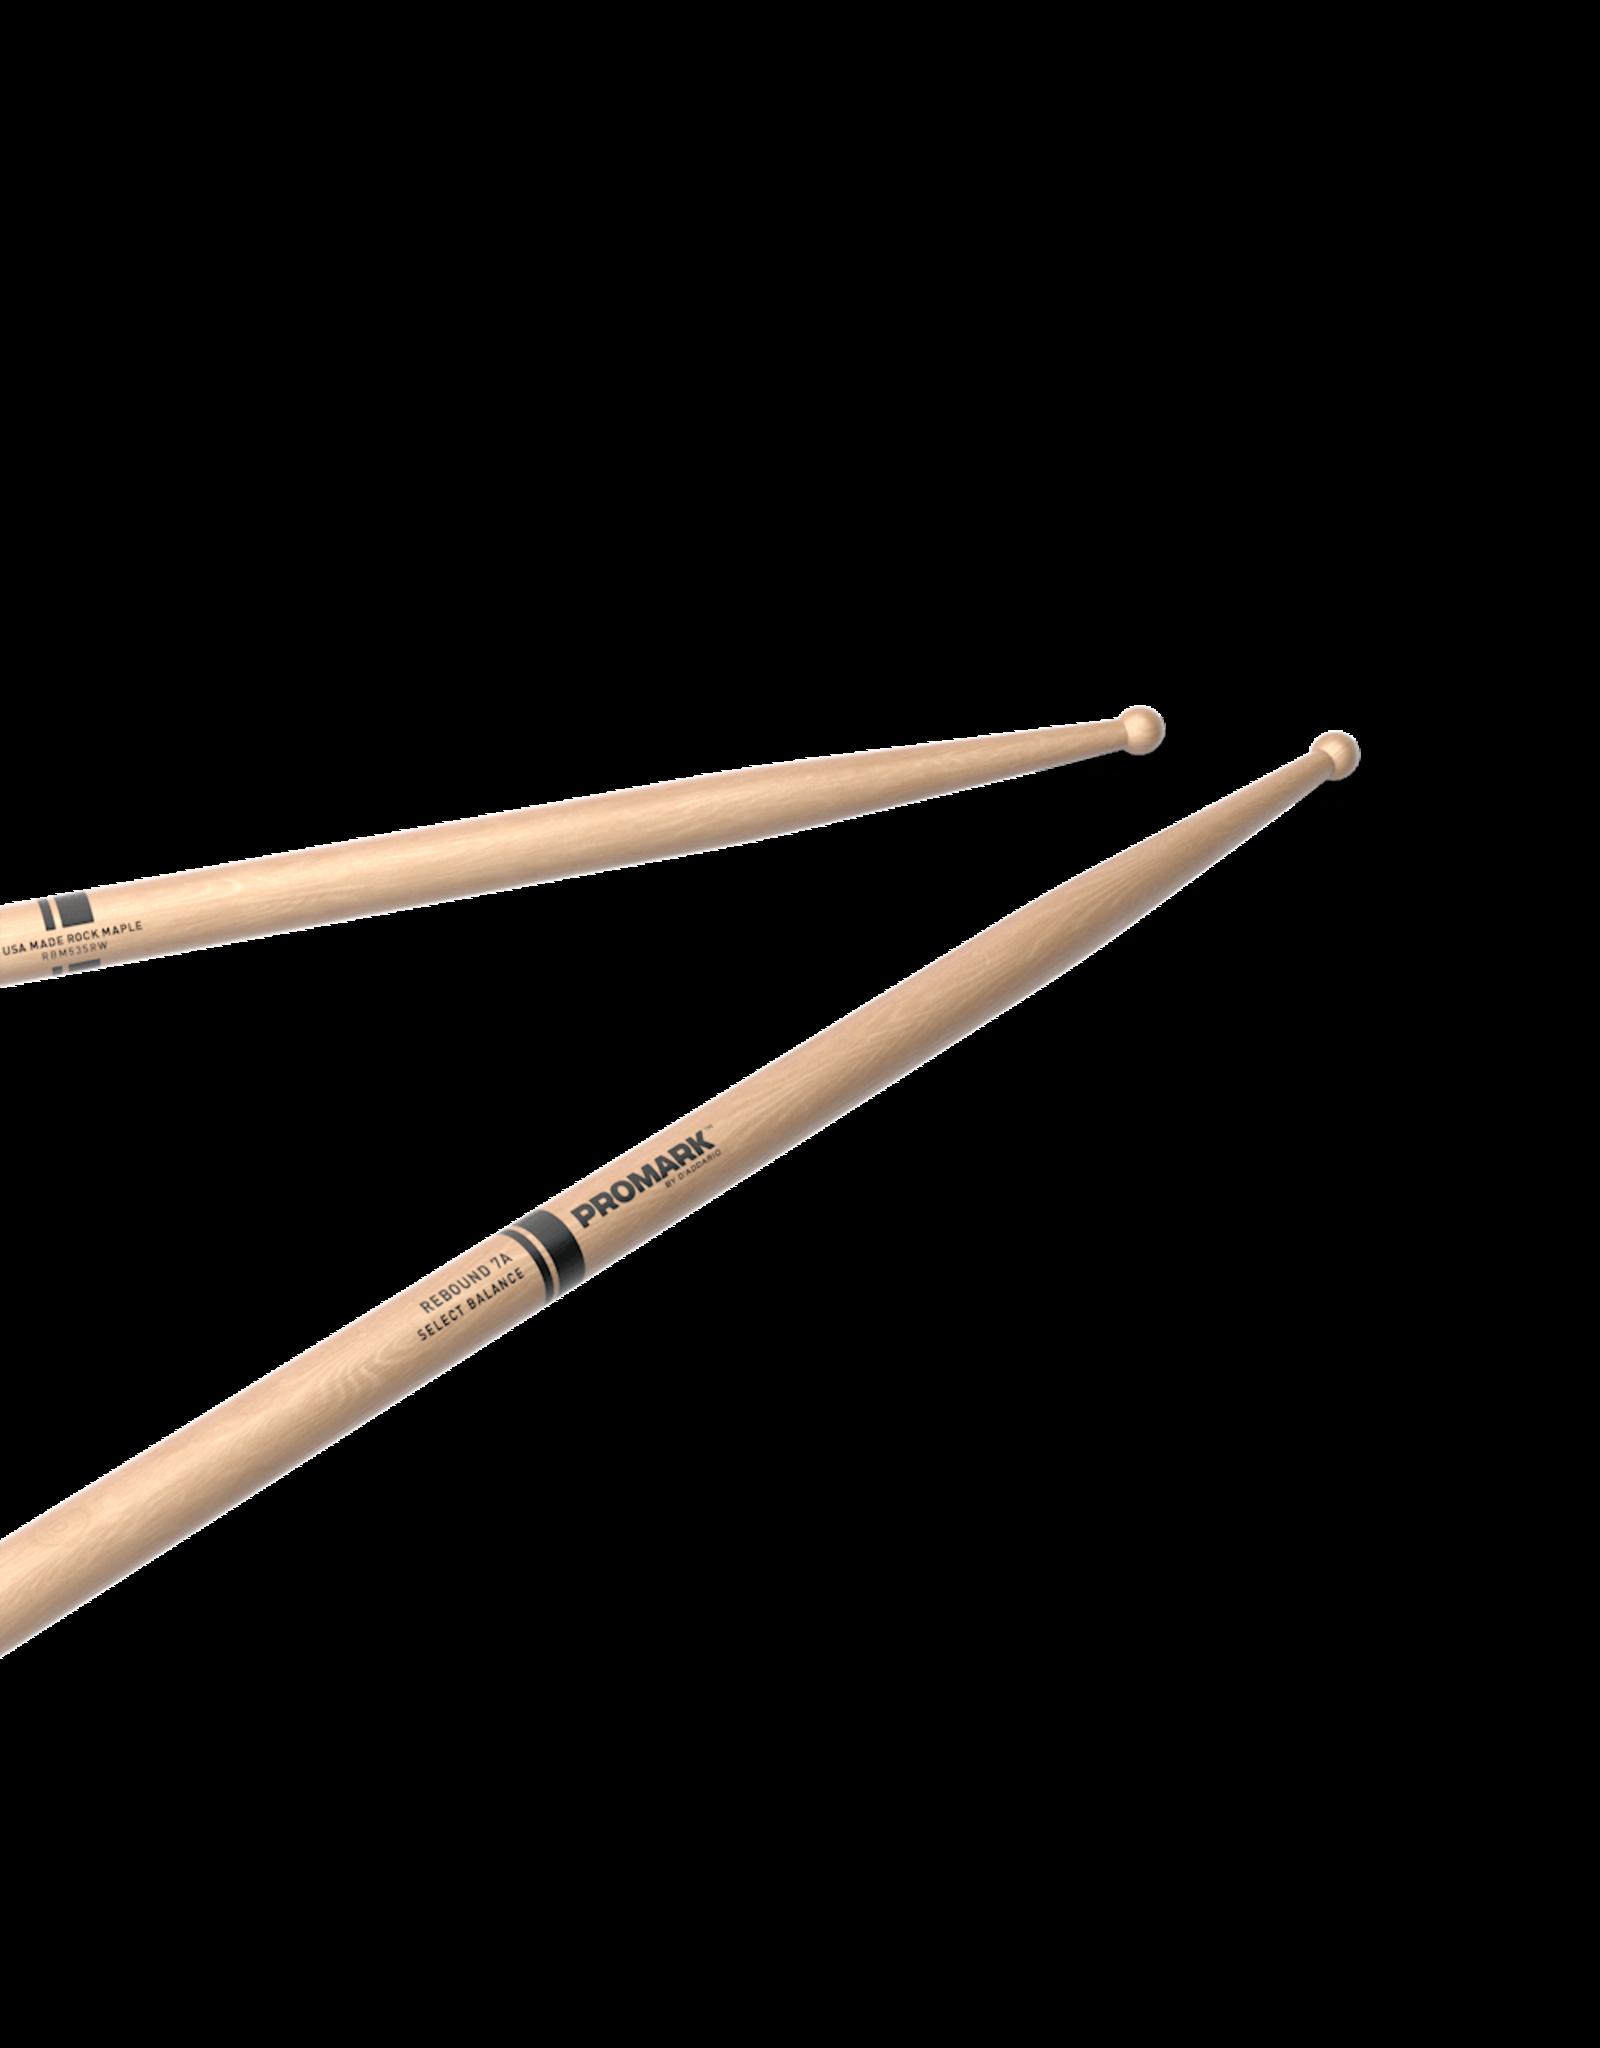 Promark Promark REBOUND 7A Maple Wood Tip Drumstick